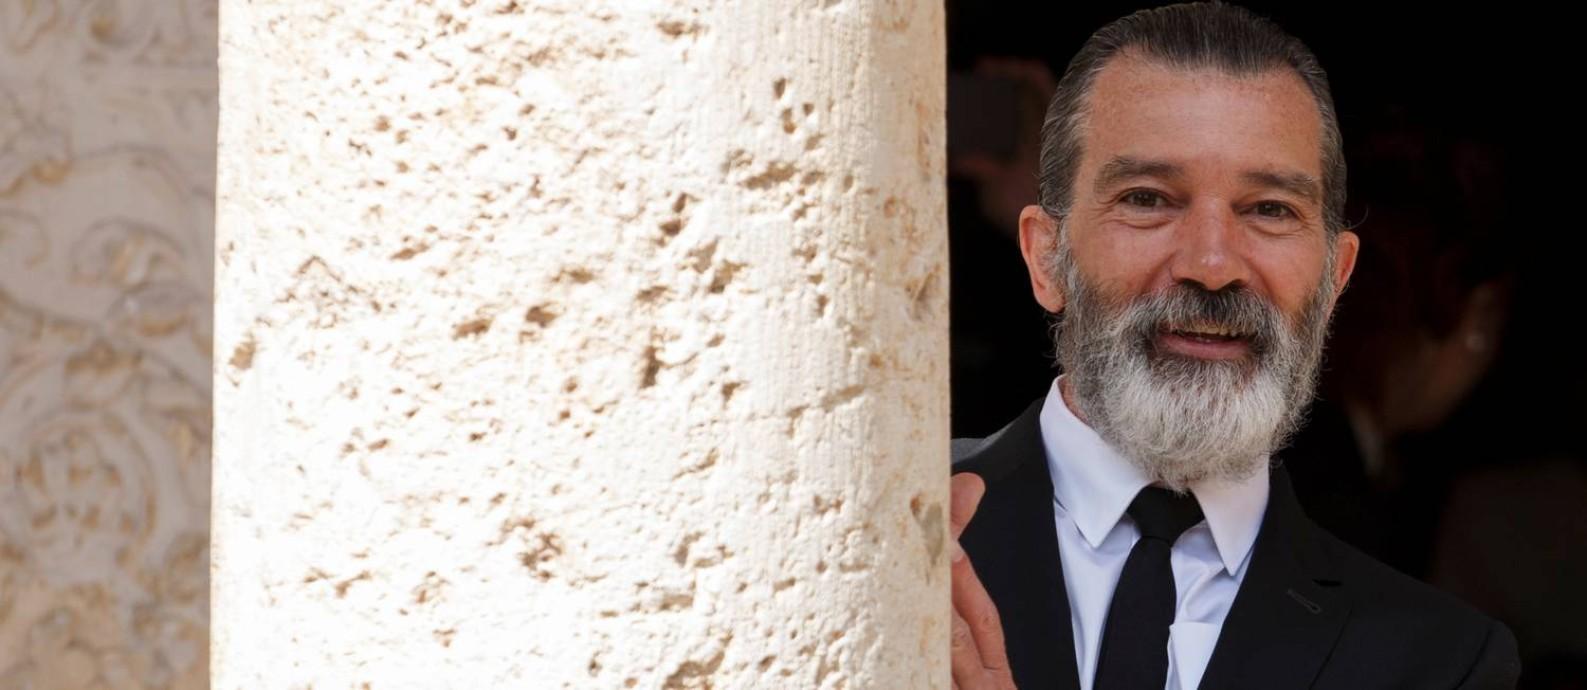 O ator espanhol Antonio Banderas Foto: SERGIO PEREZ / REUTERS